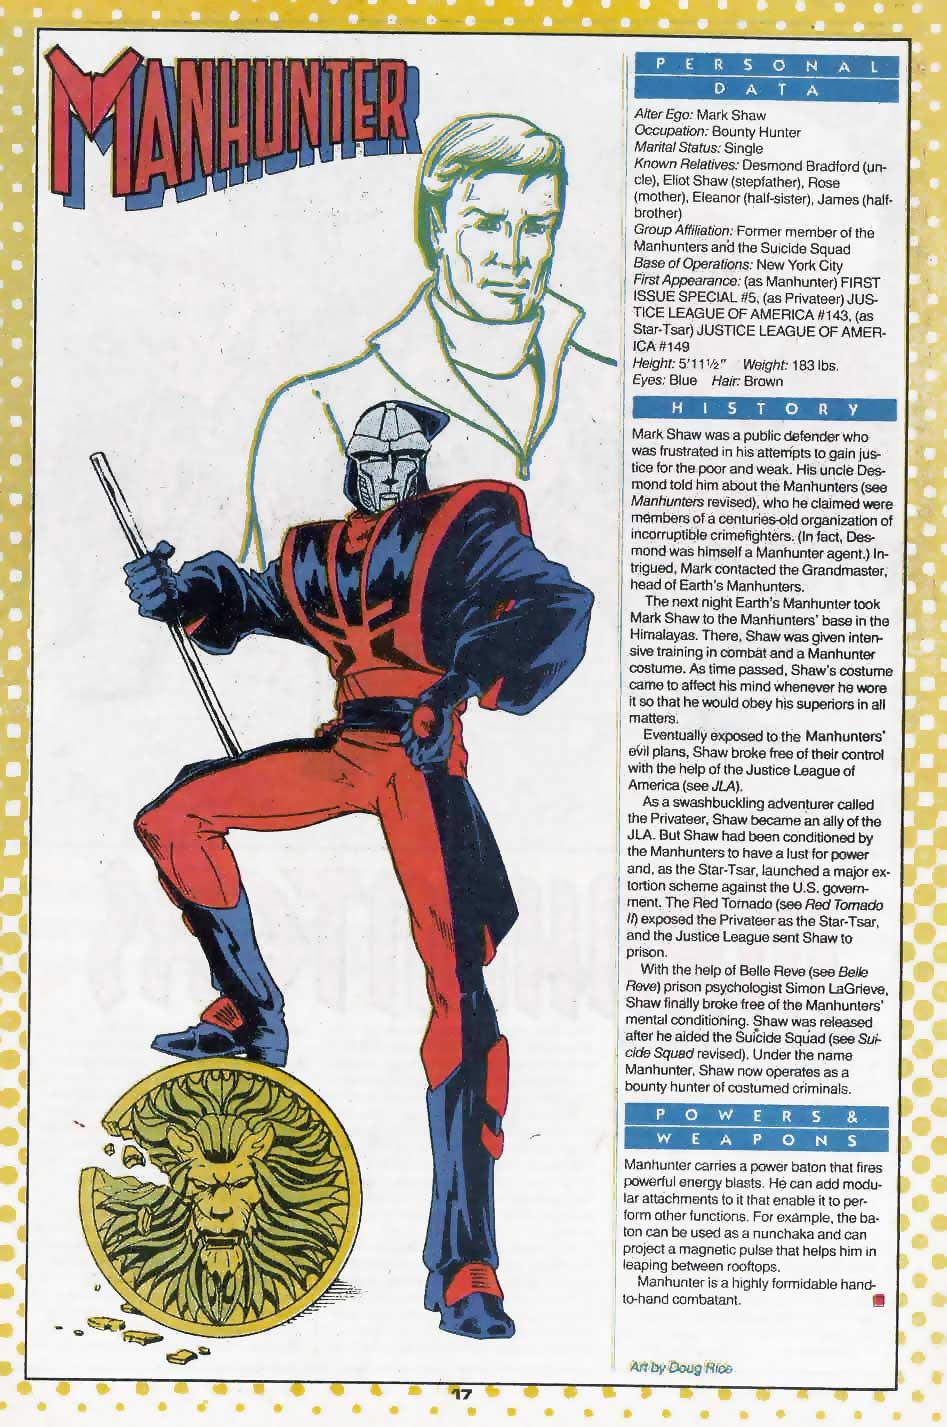 Who's Who Update 88 #2 Manhunter by Doug Rice